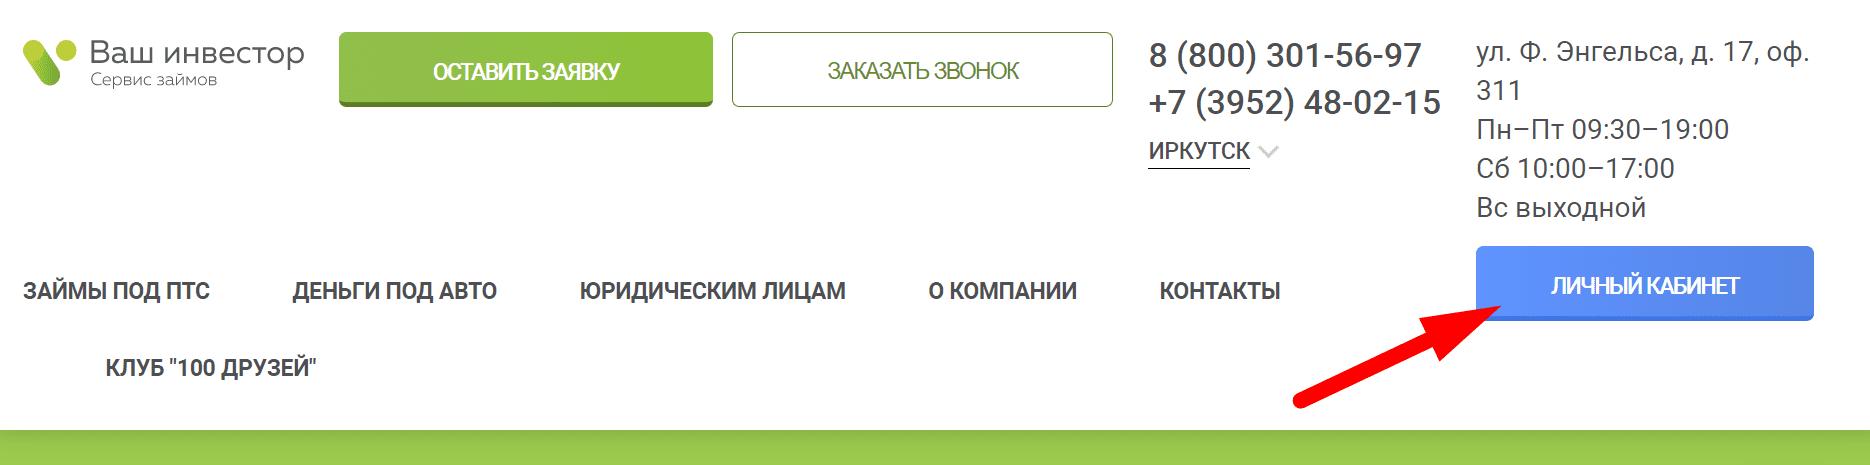 Ссылка на сайт сервиса займов «Ваш инвестор»